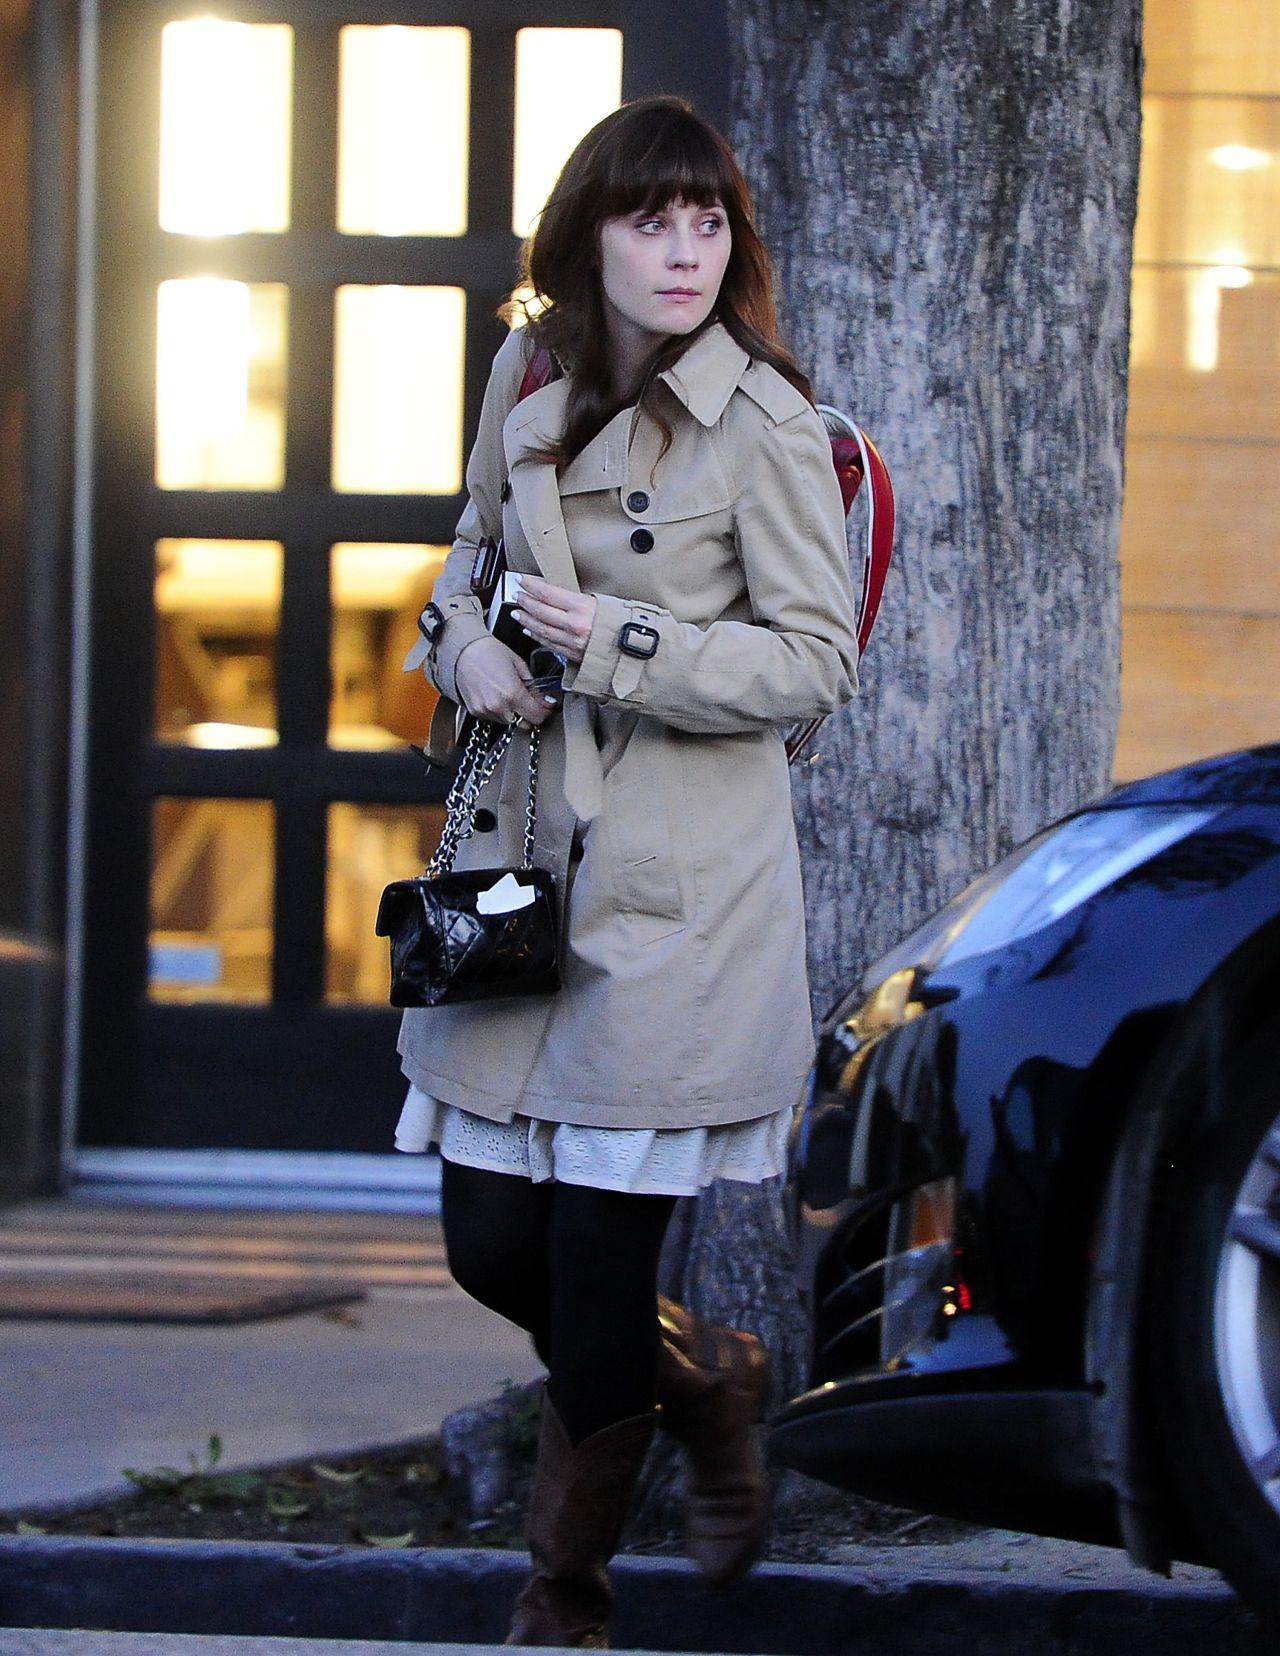 Zooey Deschanel Leaving Hair Salon in Beverly Hills, March 2014